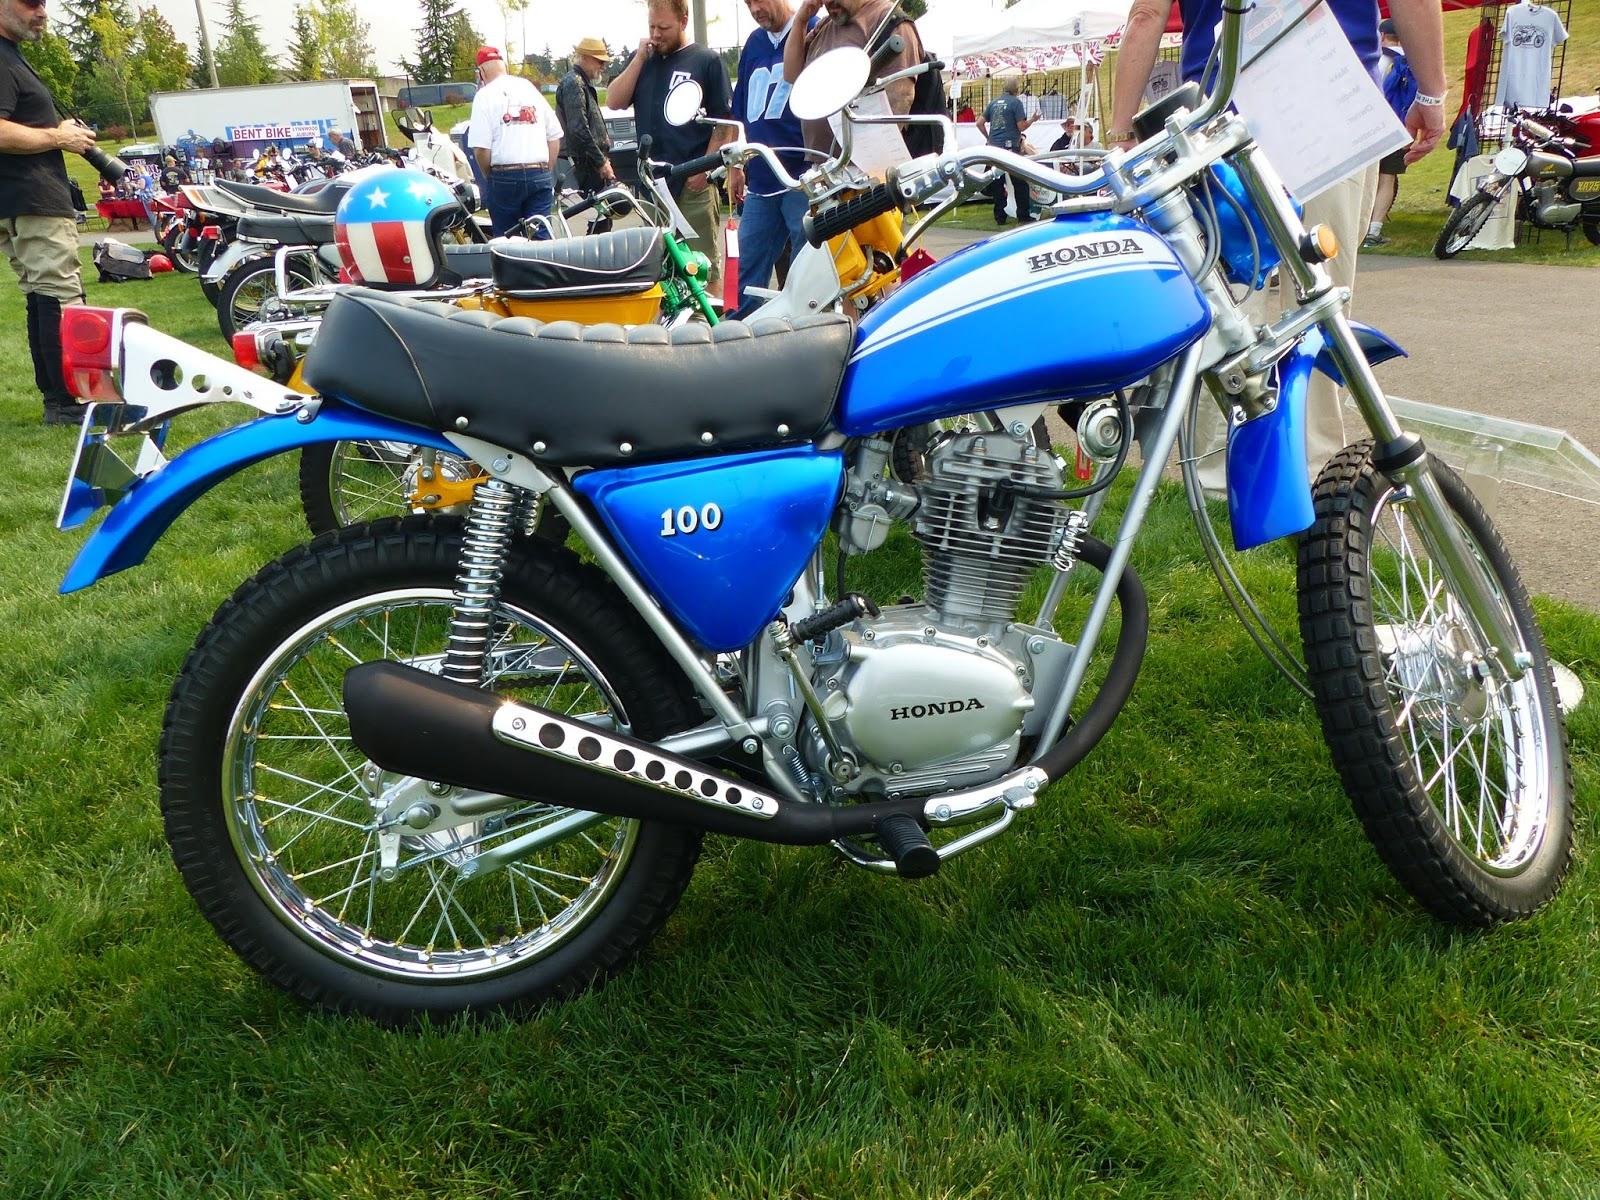 Oldmotodude 1970 Honda Sl100 On Display At The Meet 2015 Vintage 50cc Dirt Bike Motorcycle Festival Tacoma Wa